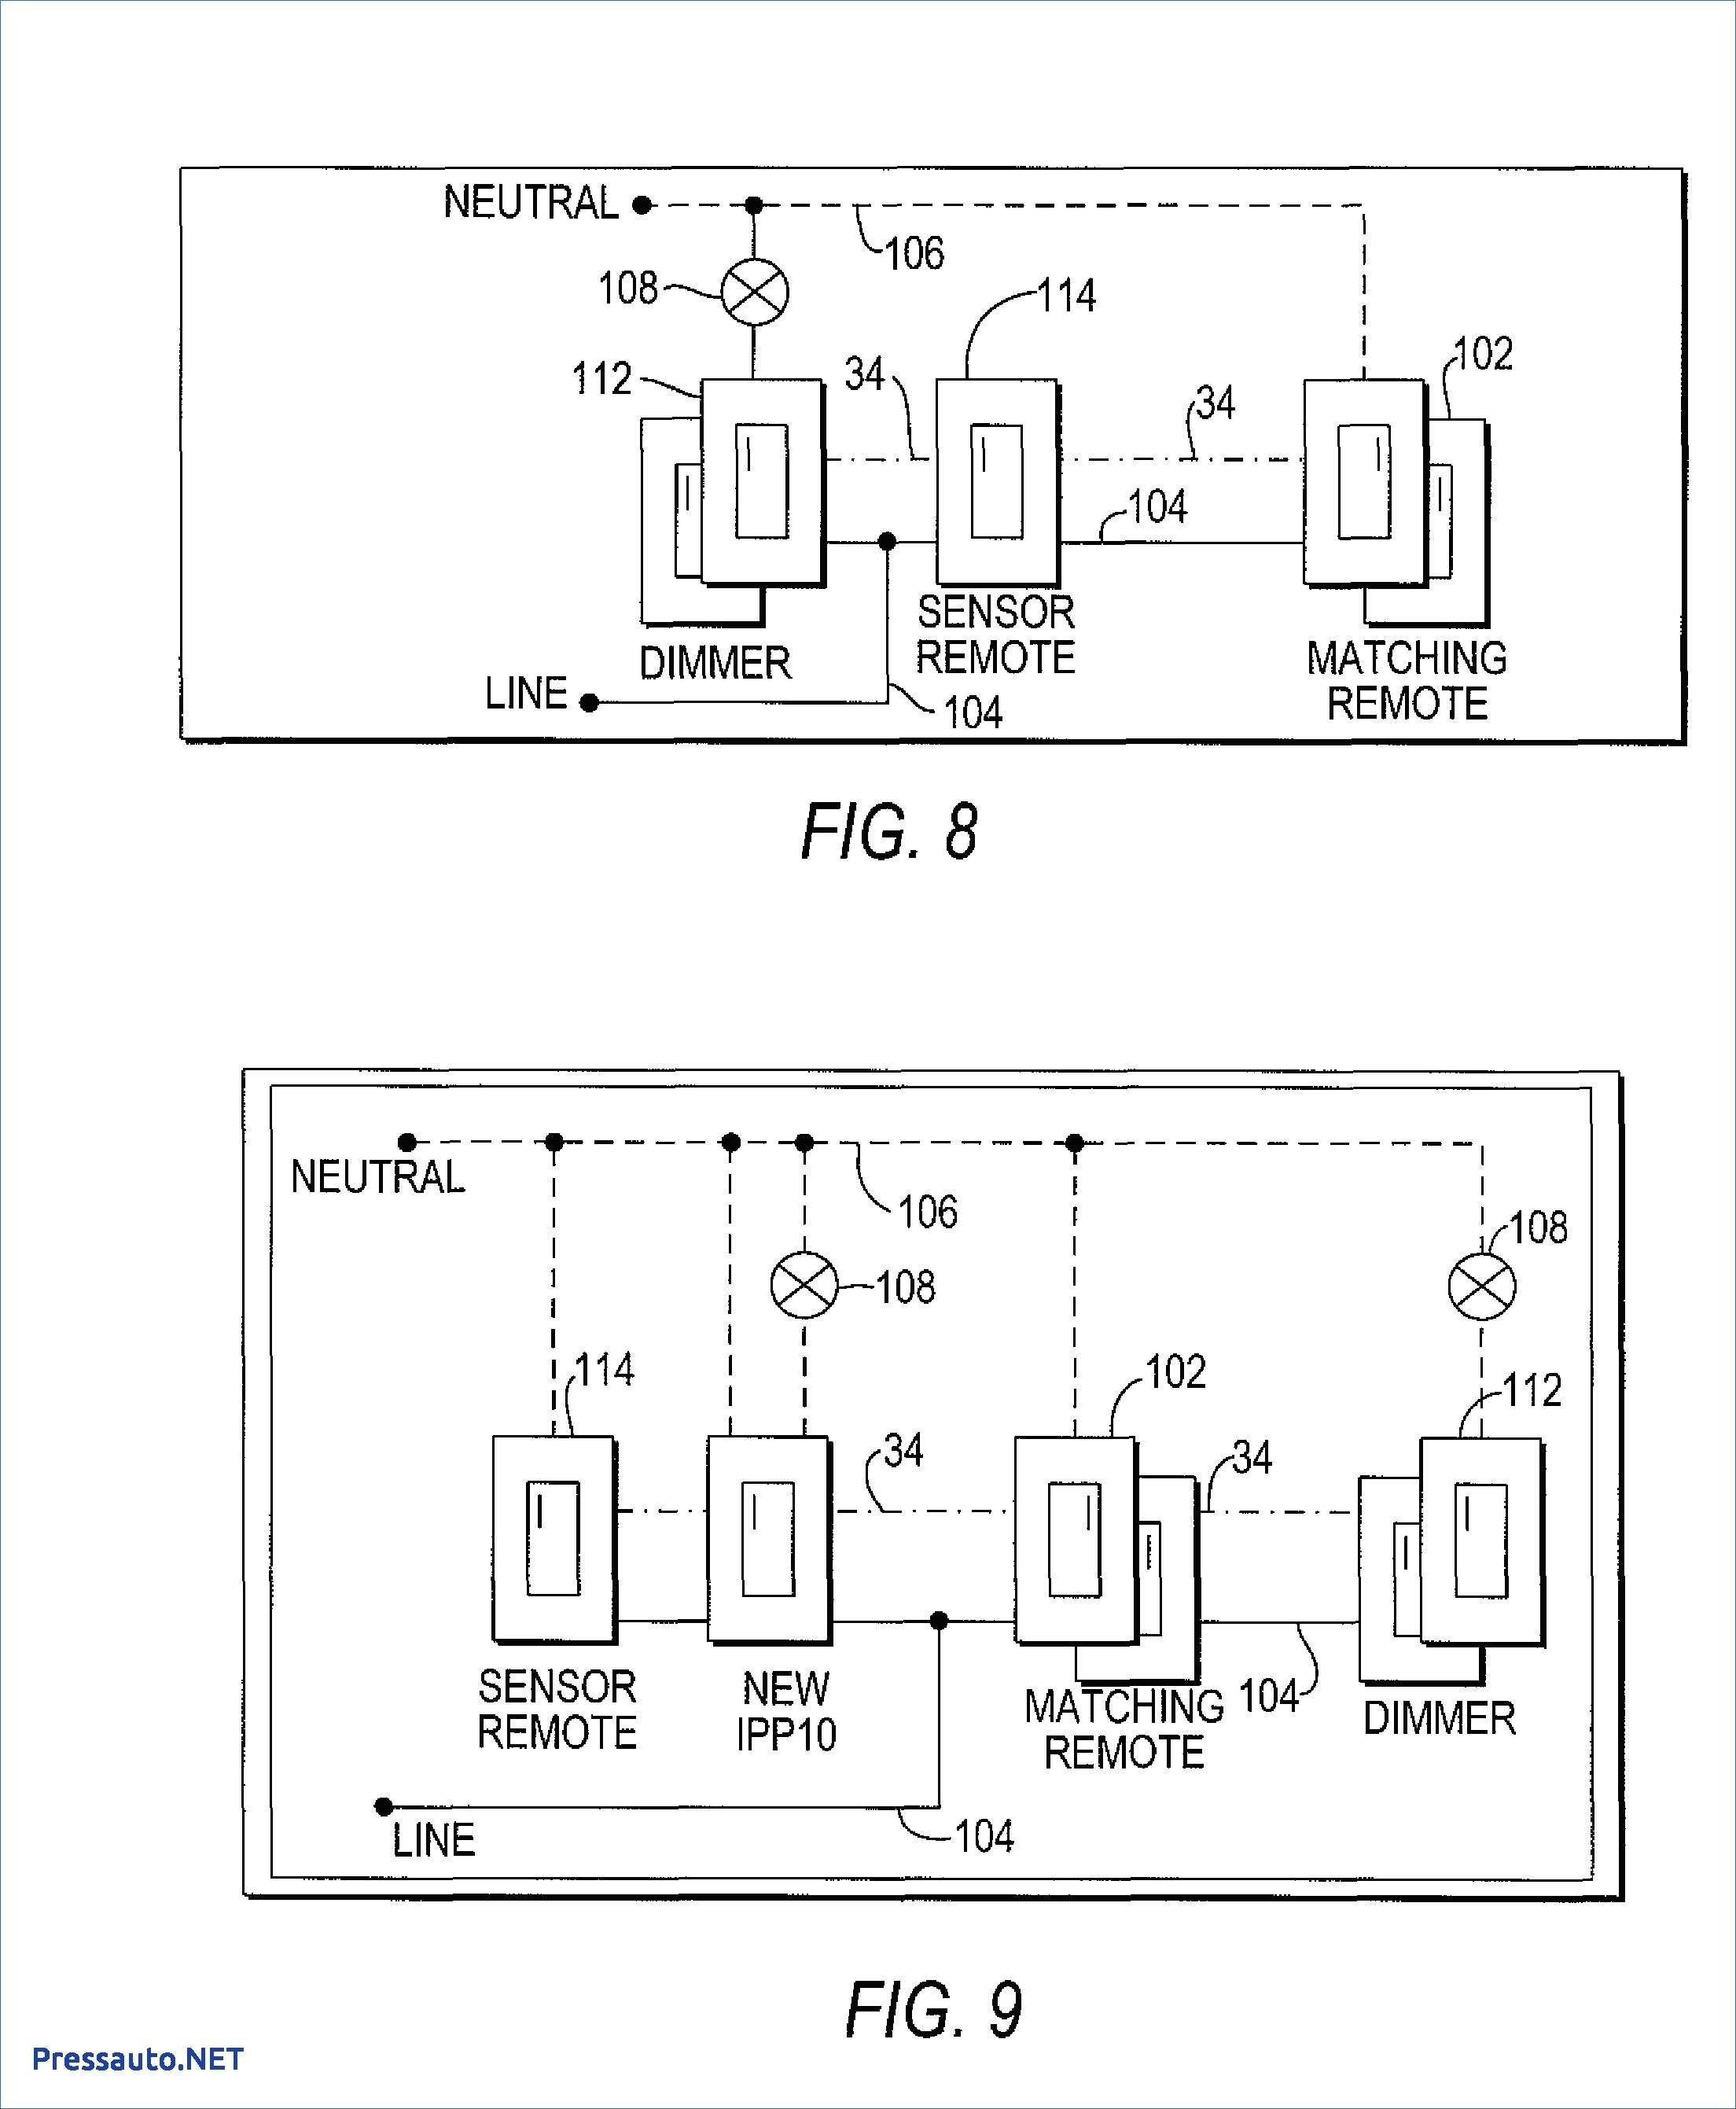 Lutron Maestro Cl Dimmer 3 Way Diagram In Wiring Digital - Lutron Dimmer Wiring Diagram